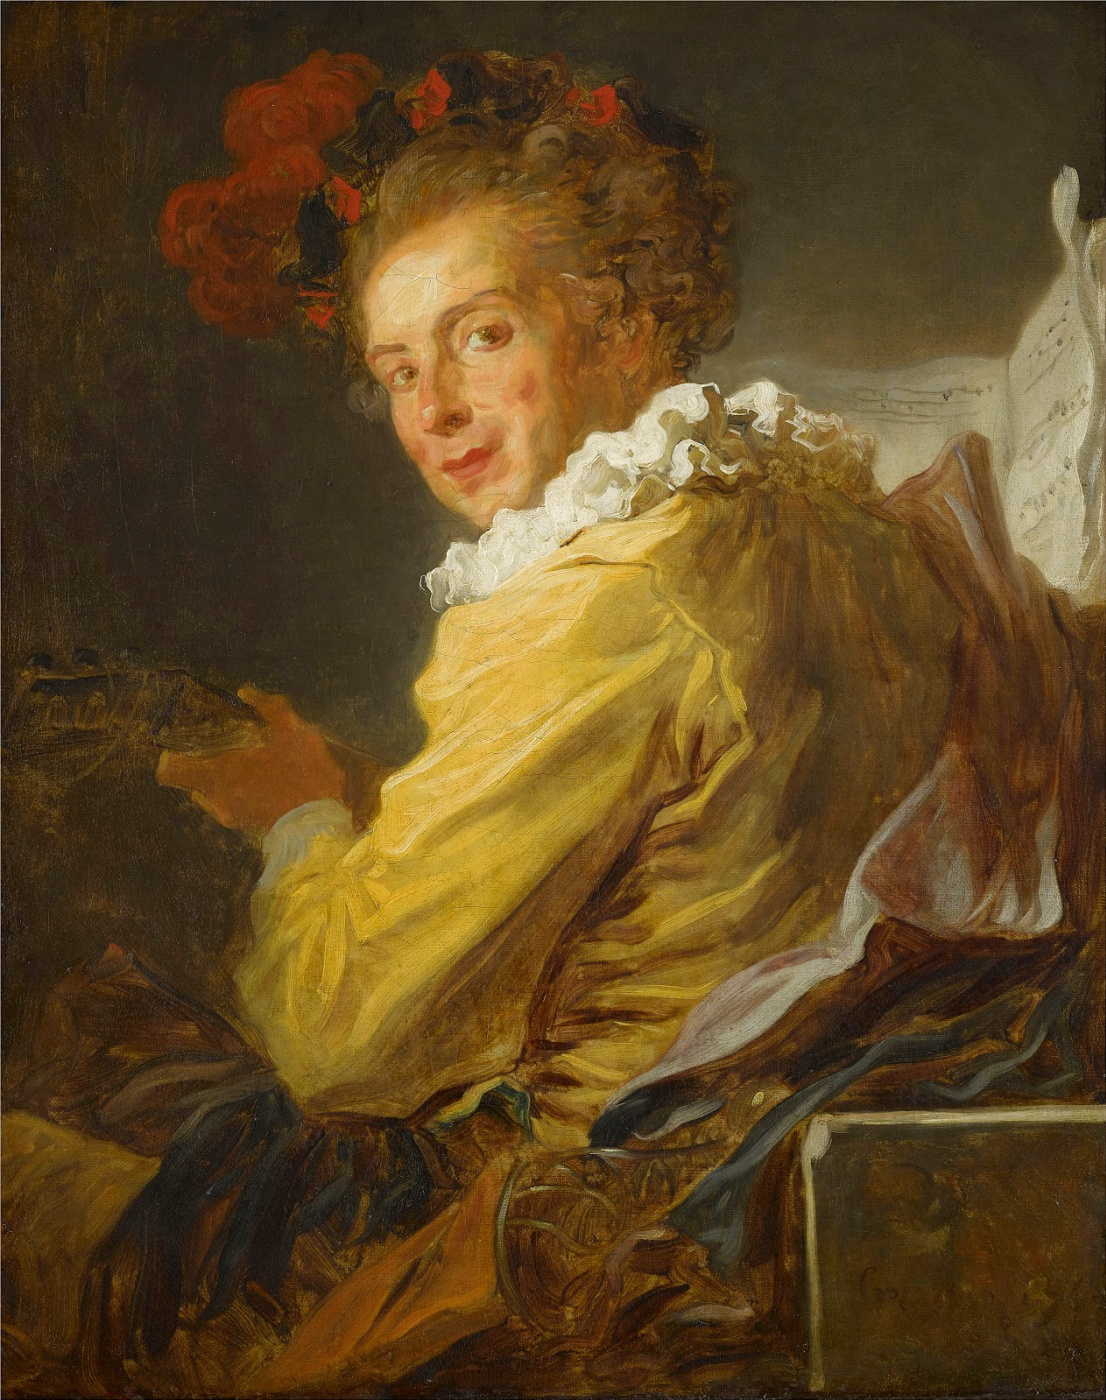 Jean-Honore Fragonard. Portrait of Monsieur de La Breteche